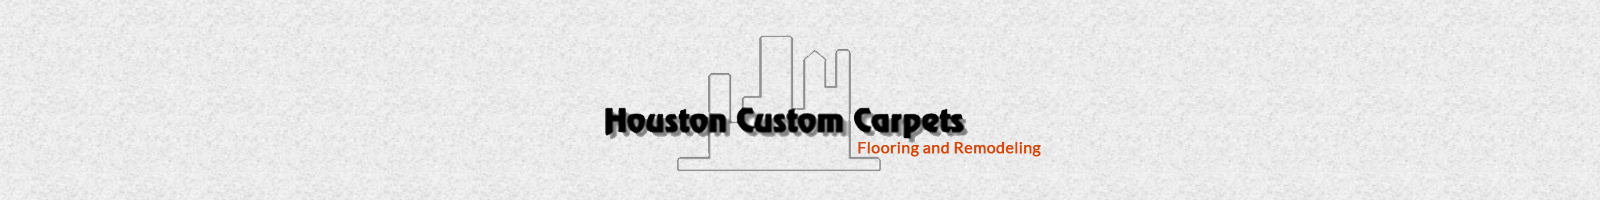 custom flooring company